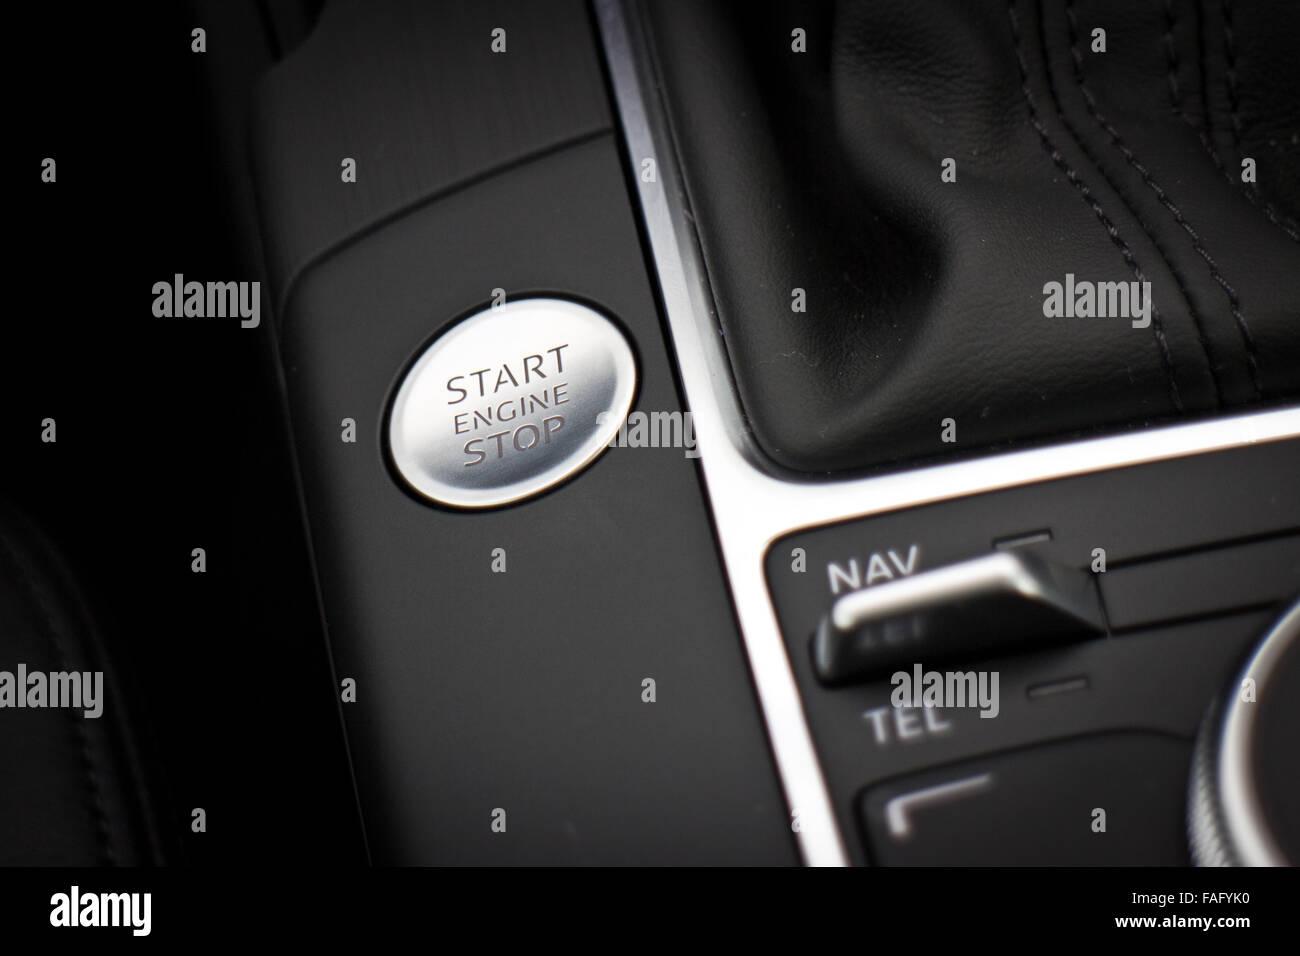 Automotive Engine Audi Stock Photos & Automotive Engine Audi